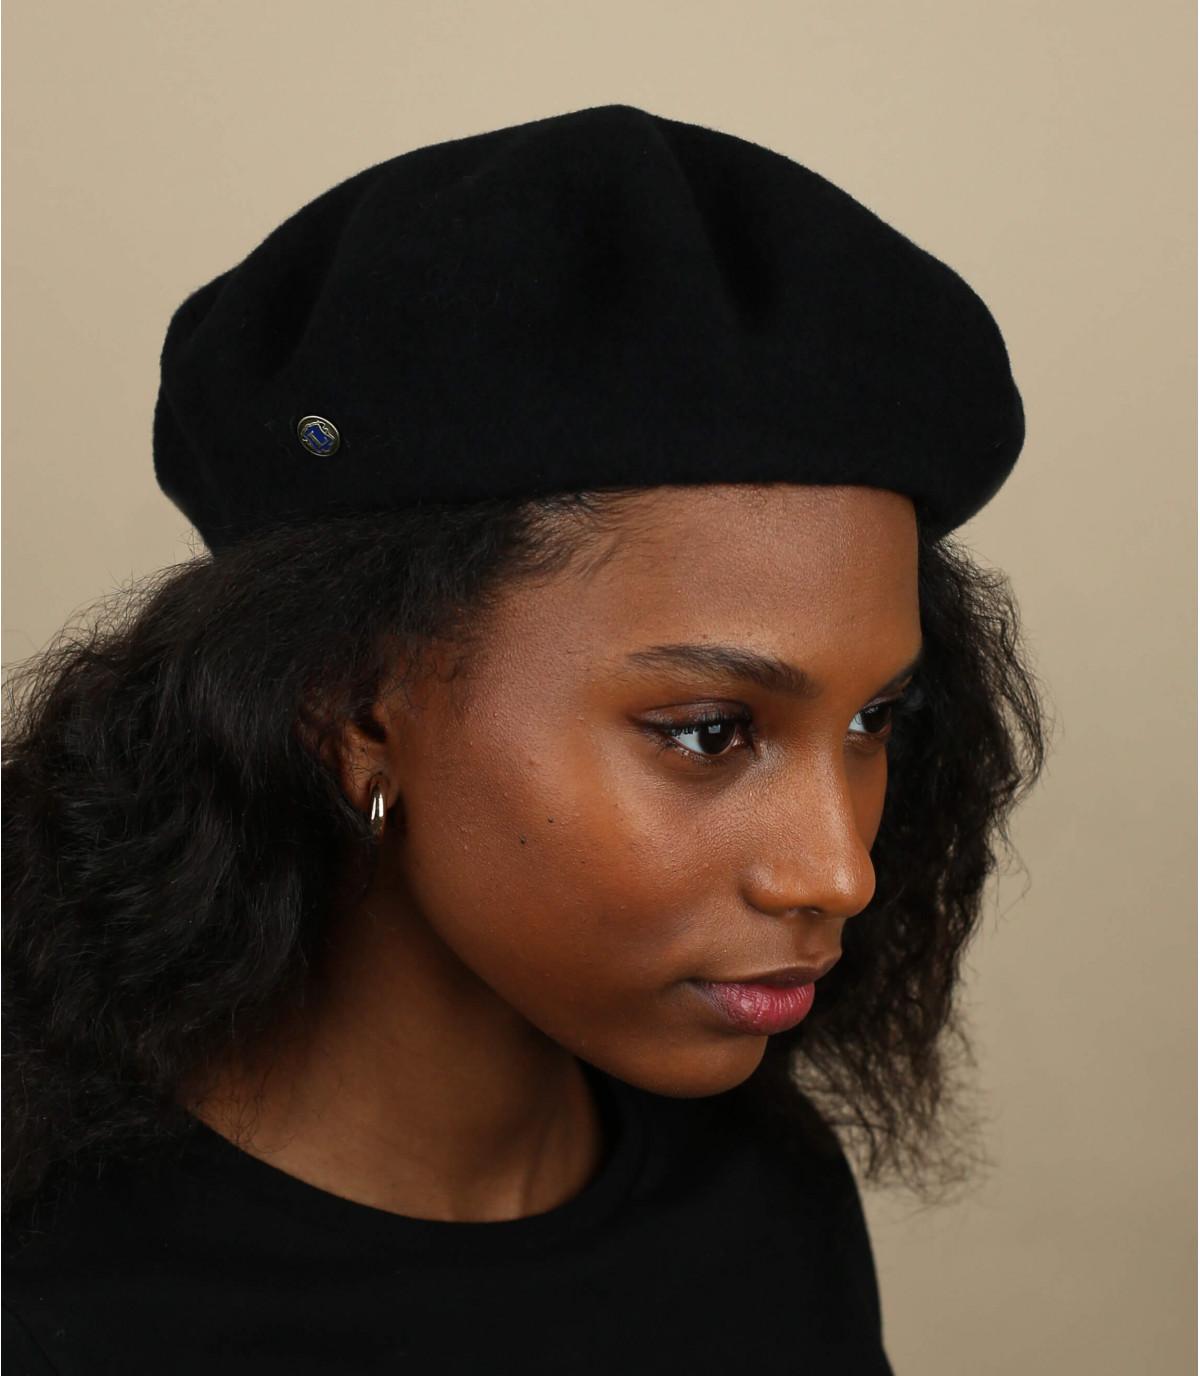 zwarte kasjmier baret